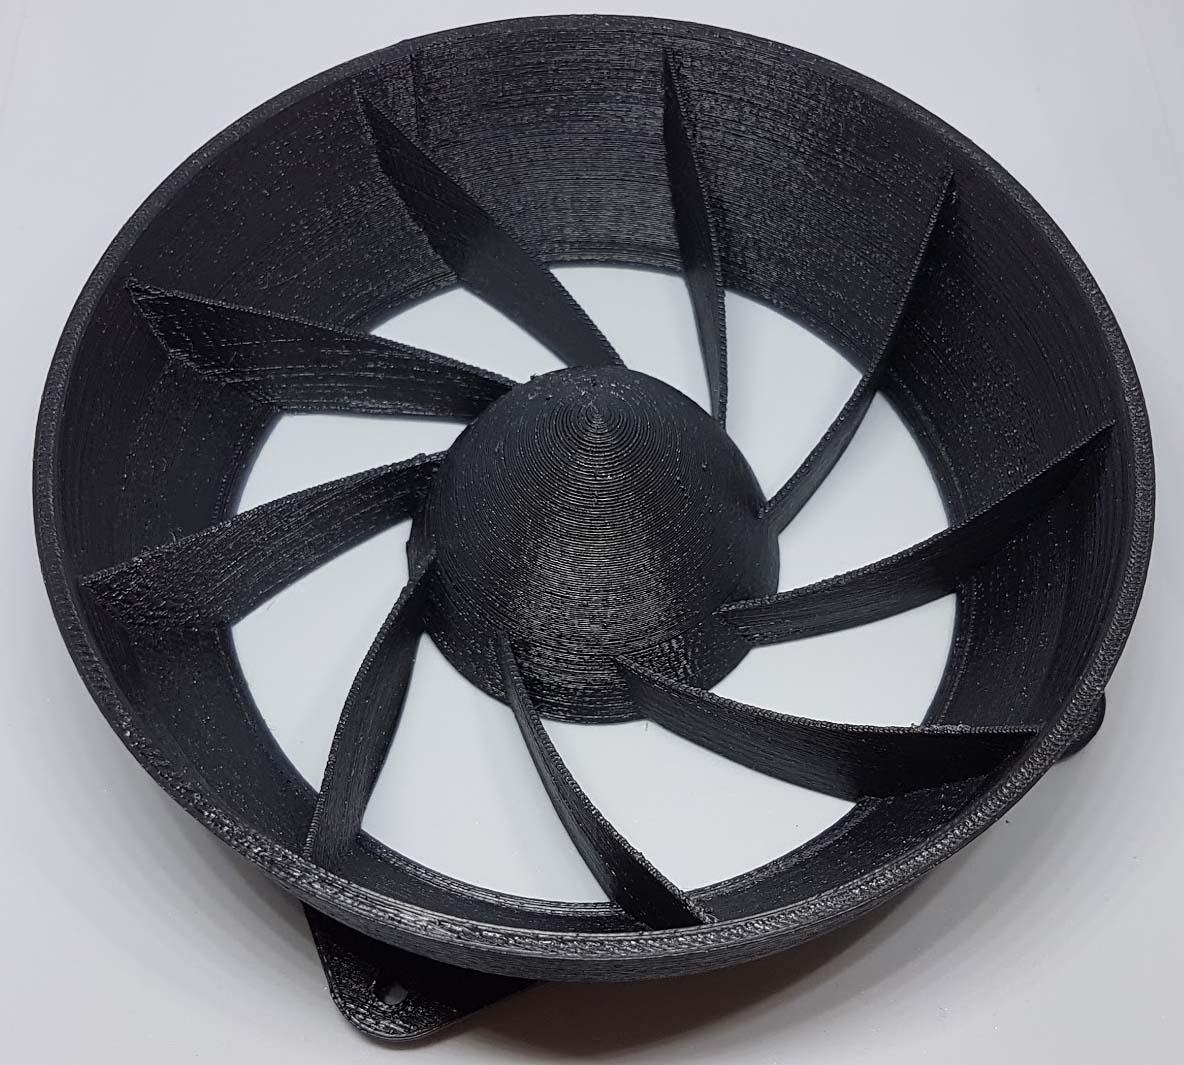 Antminer/Innosilicon 9 Vane Laminar Flow Fan Shroud for